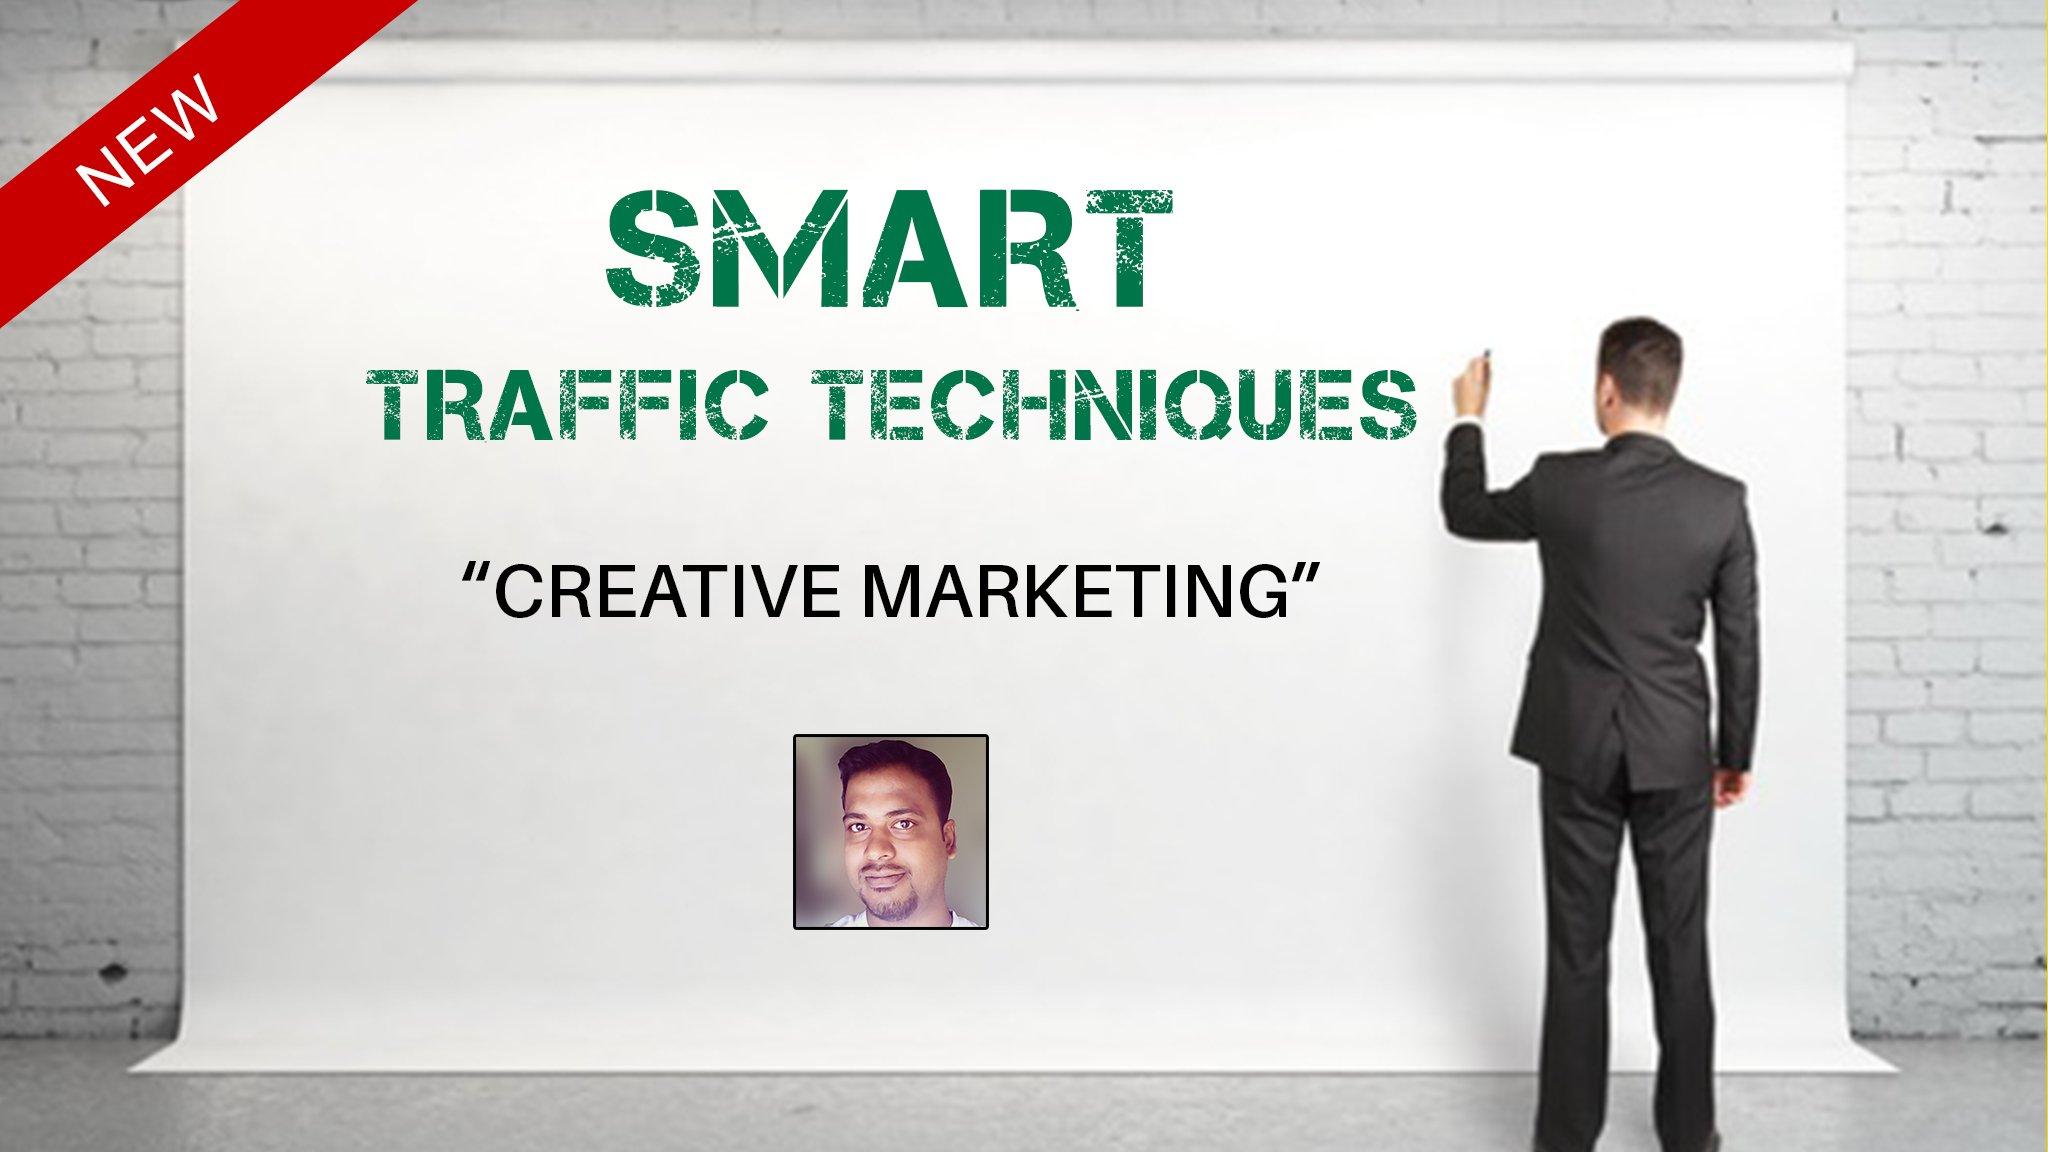 Marketing courses, skillshare courses ,